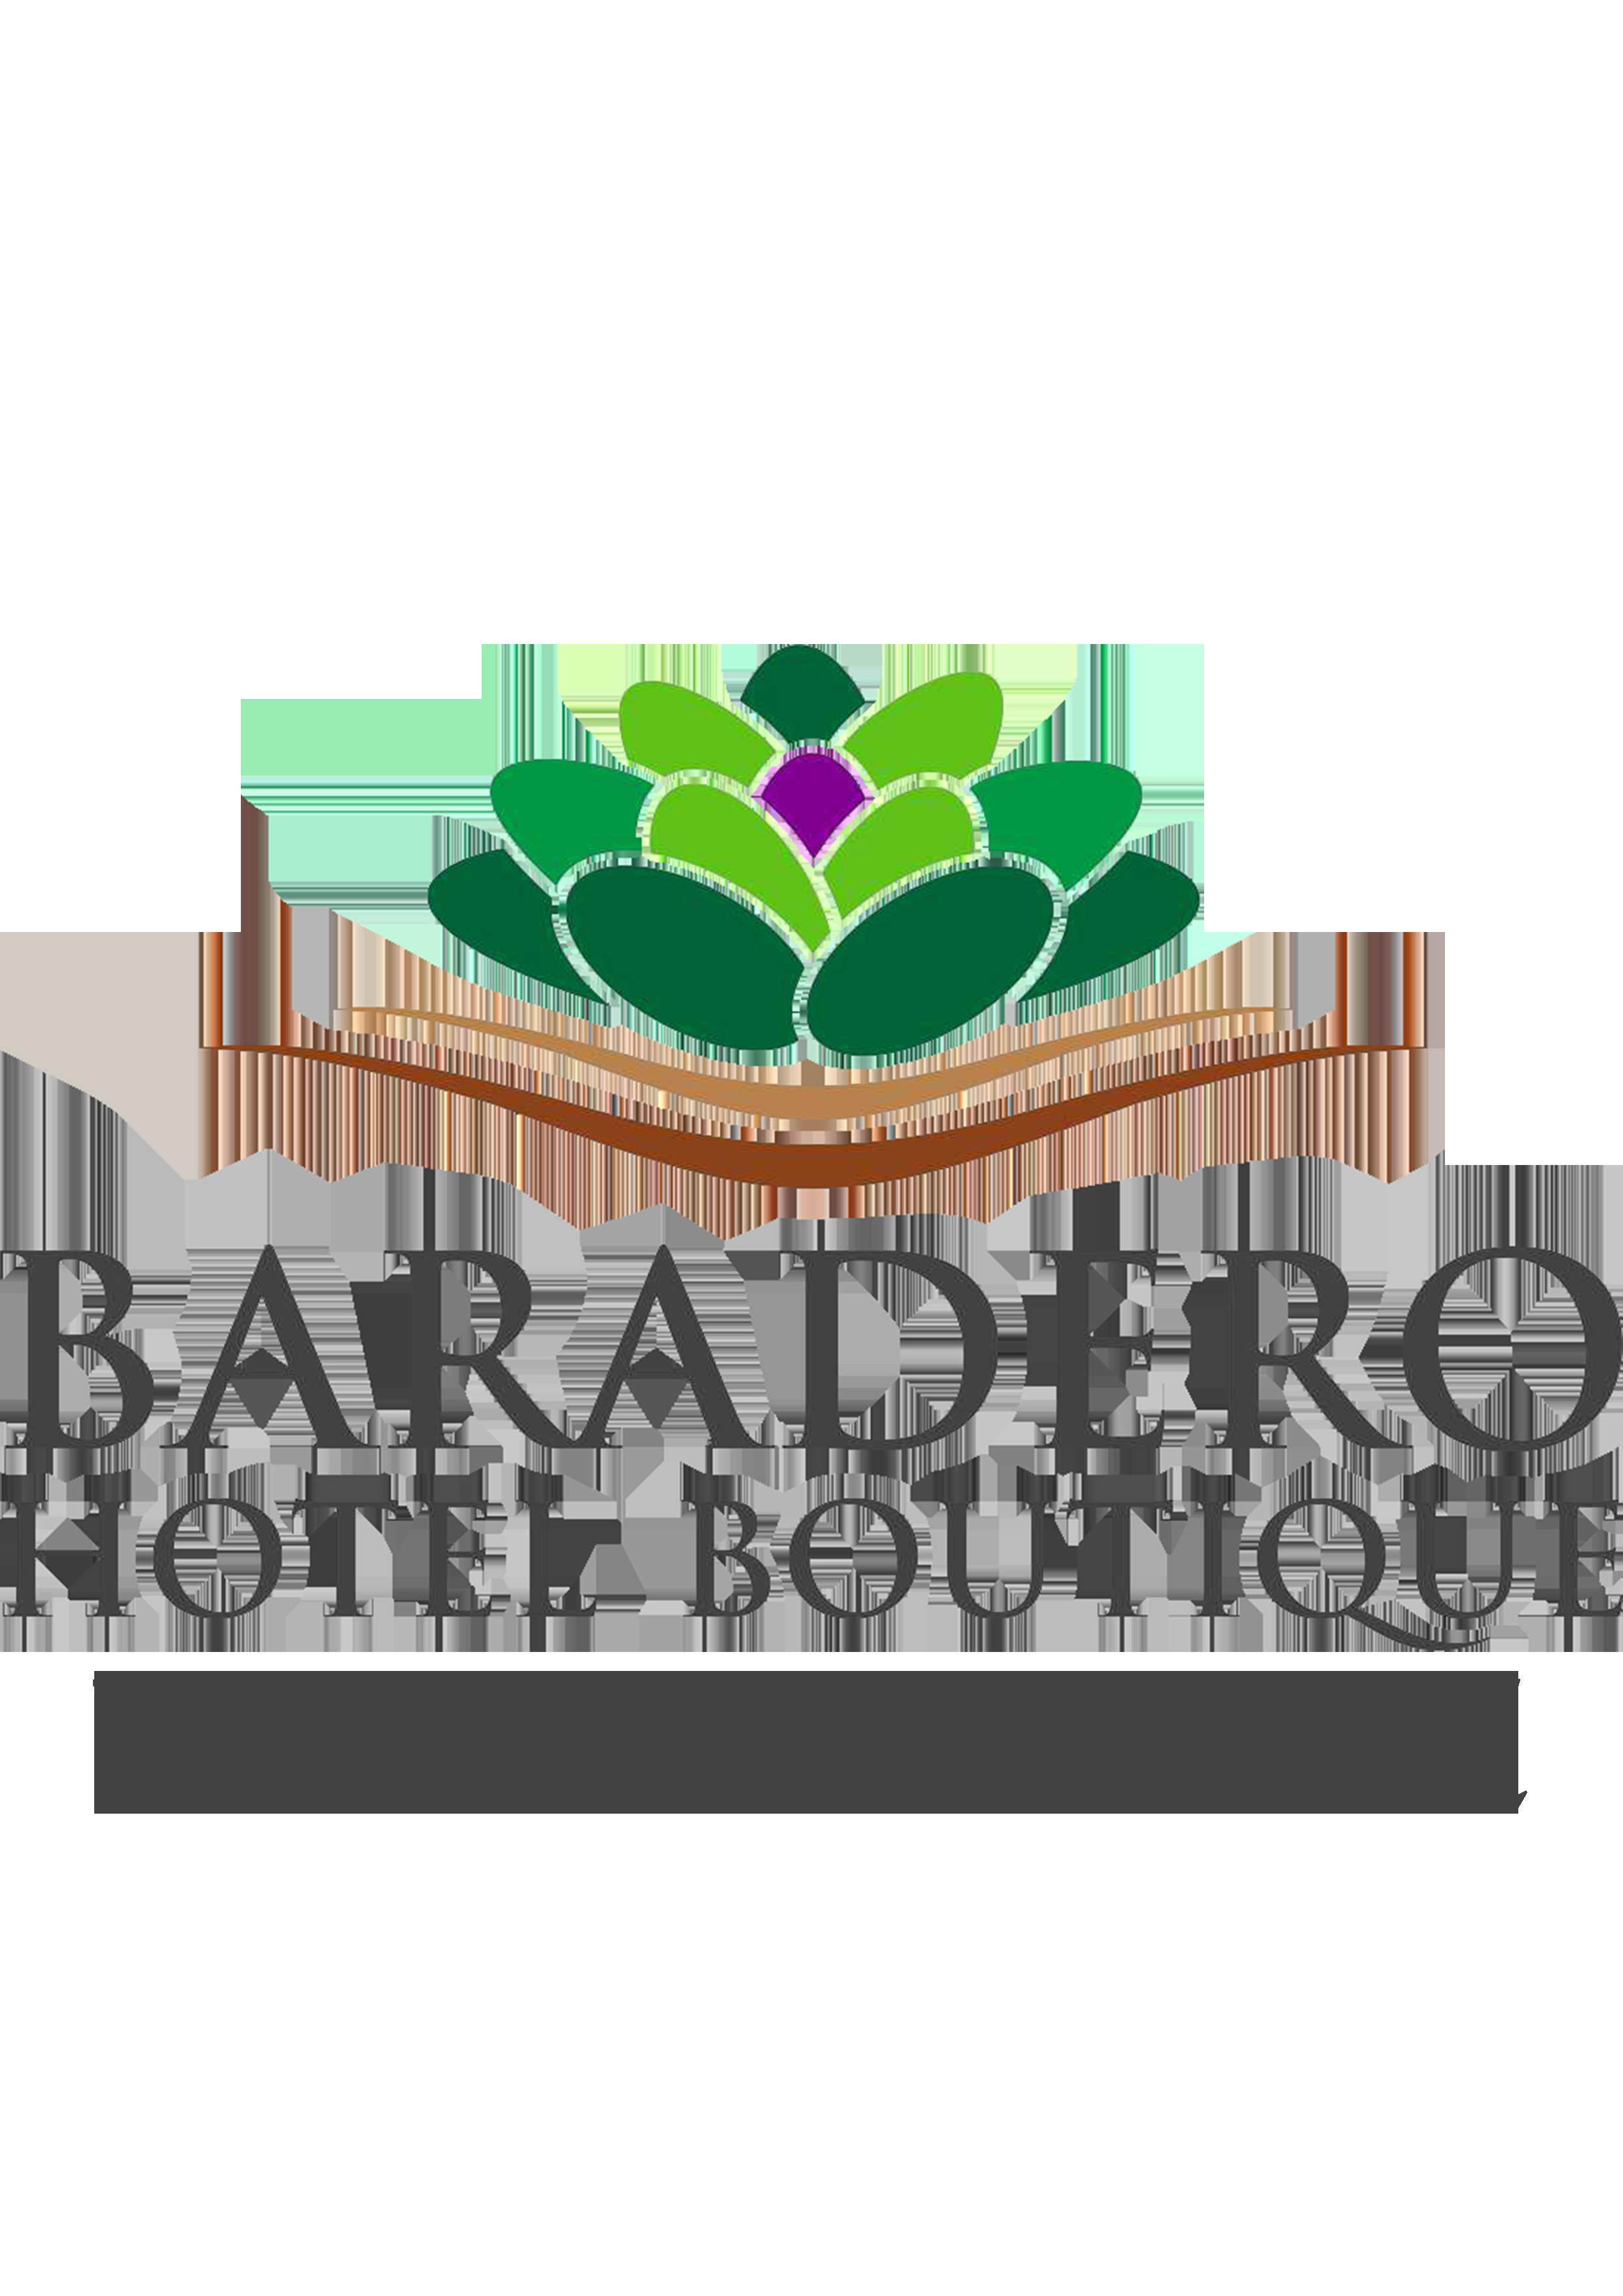 Baradero Hotel Boutique QrCarta